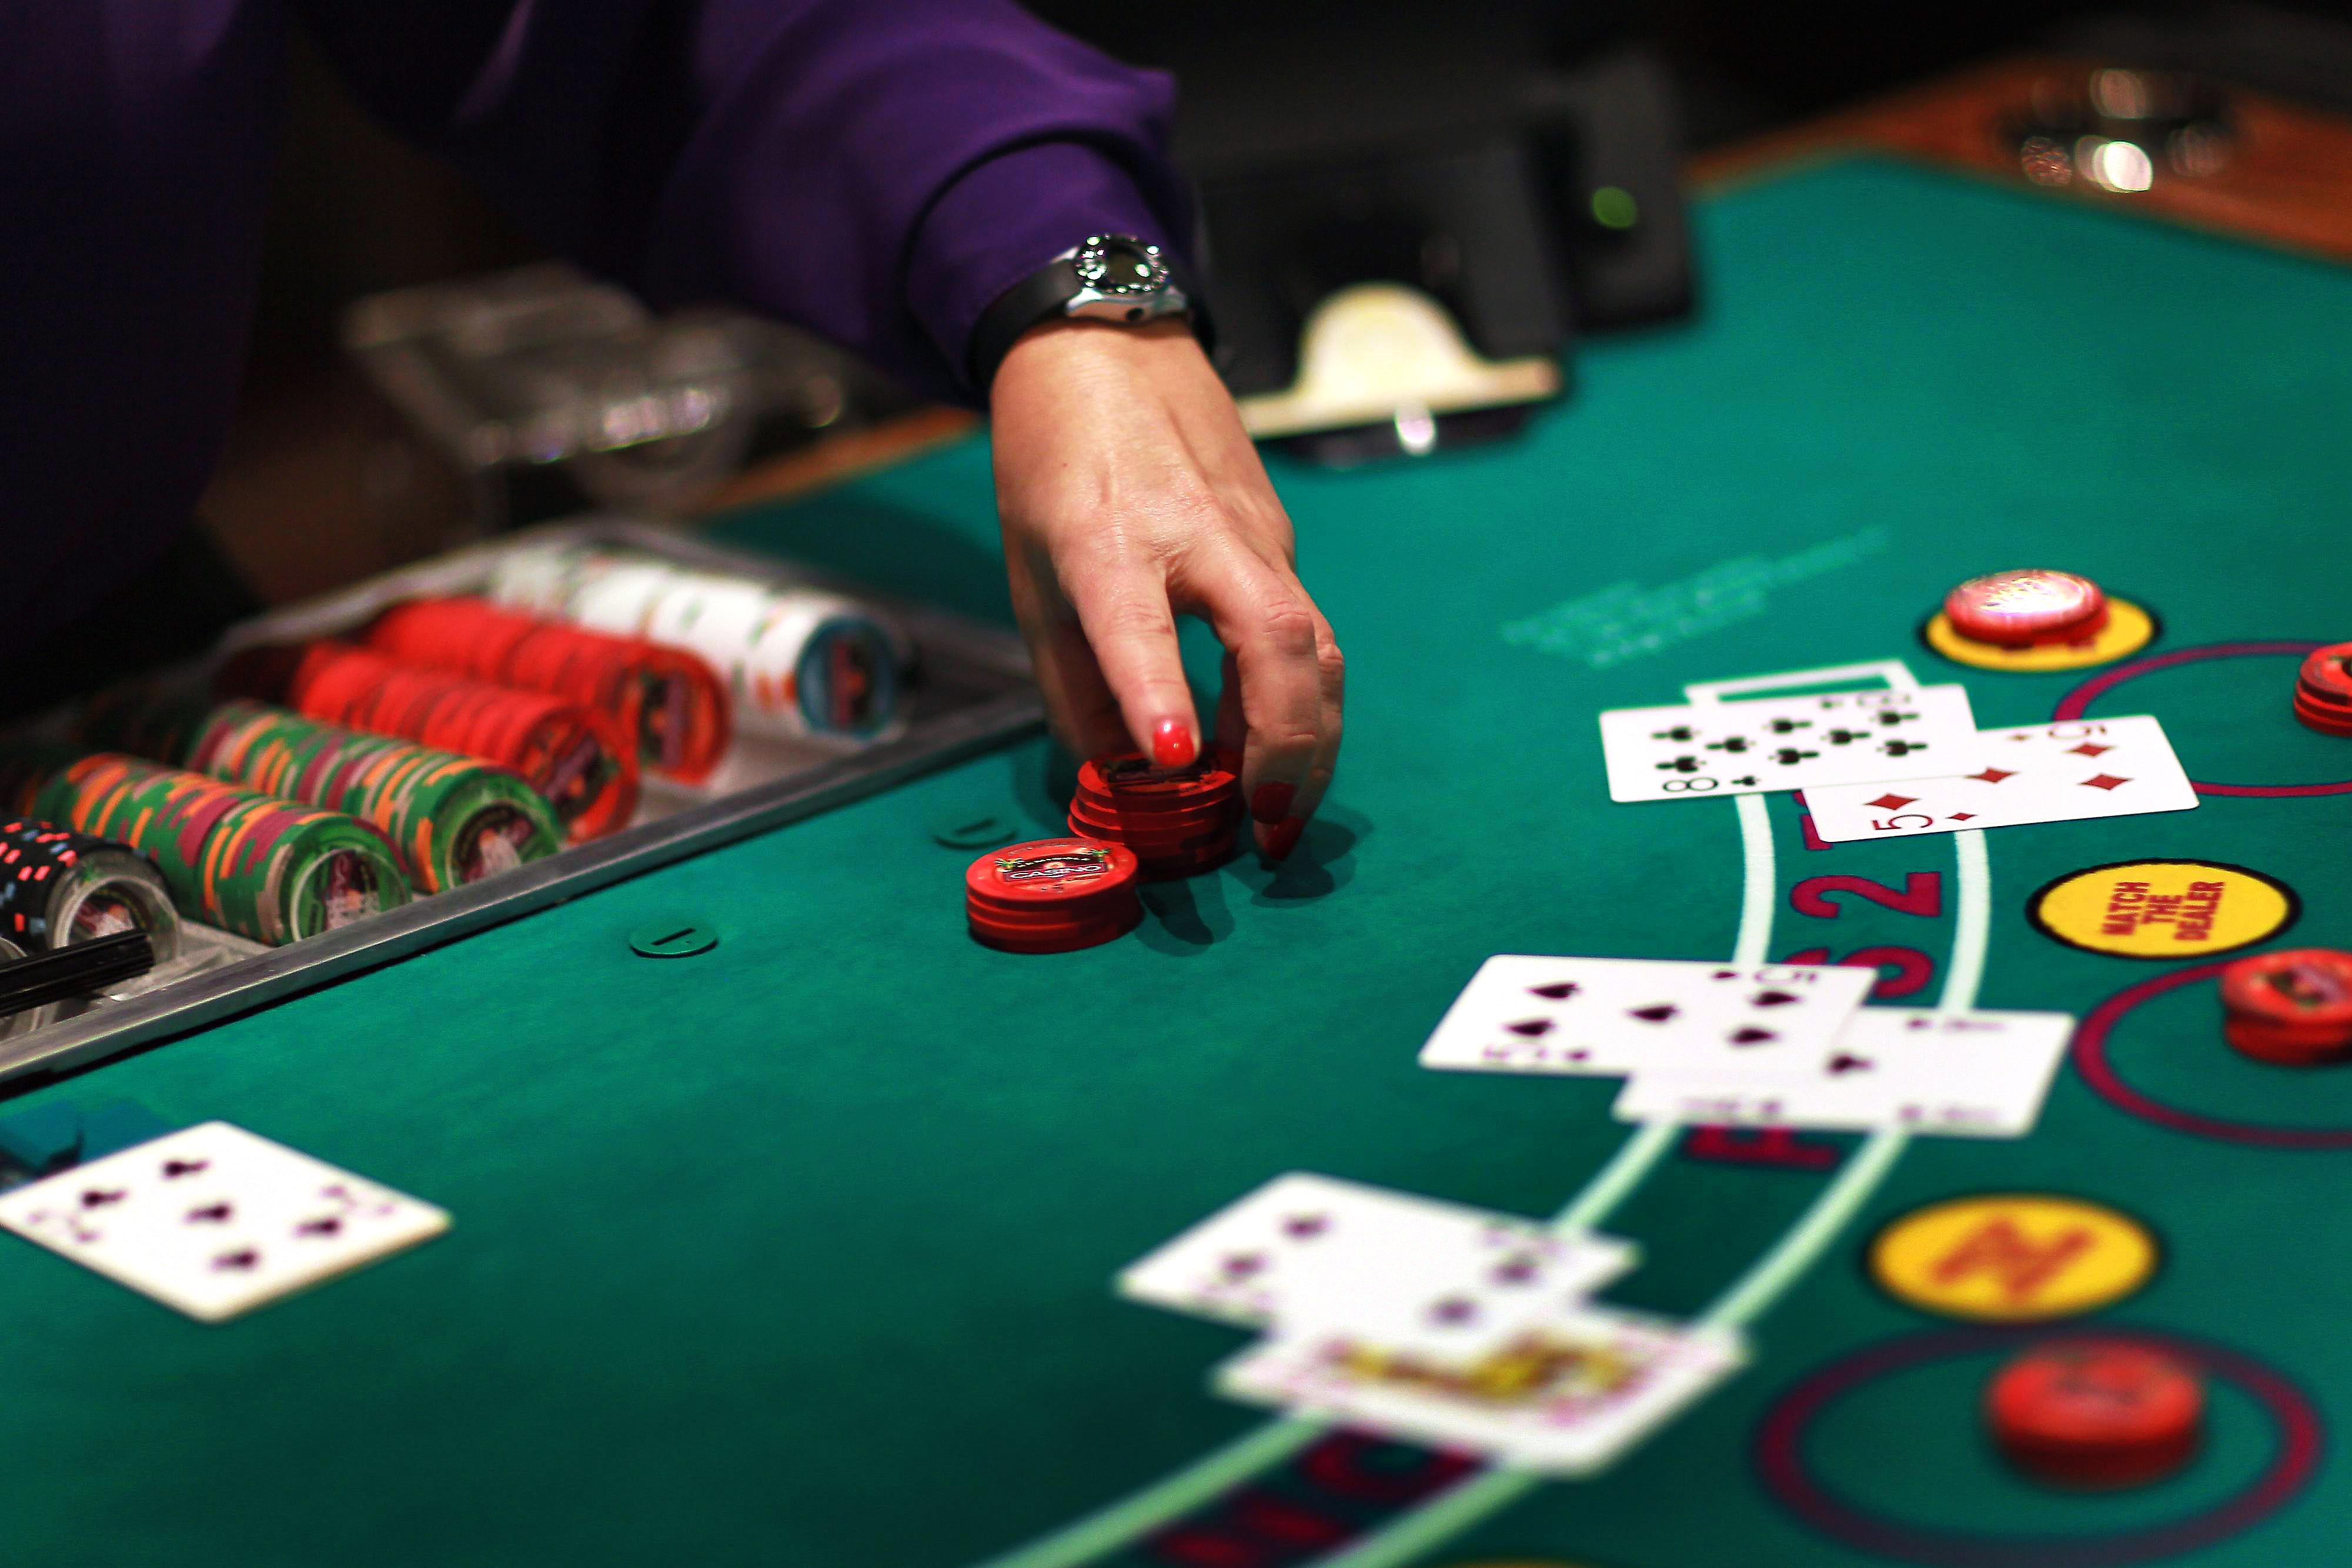 Blackjack online casino uk